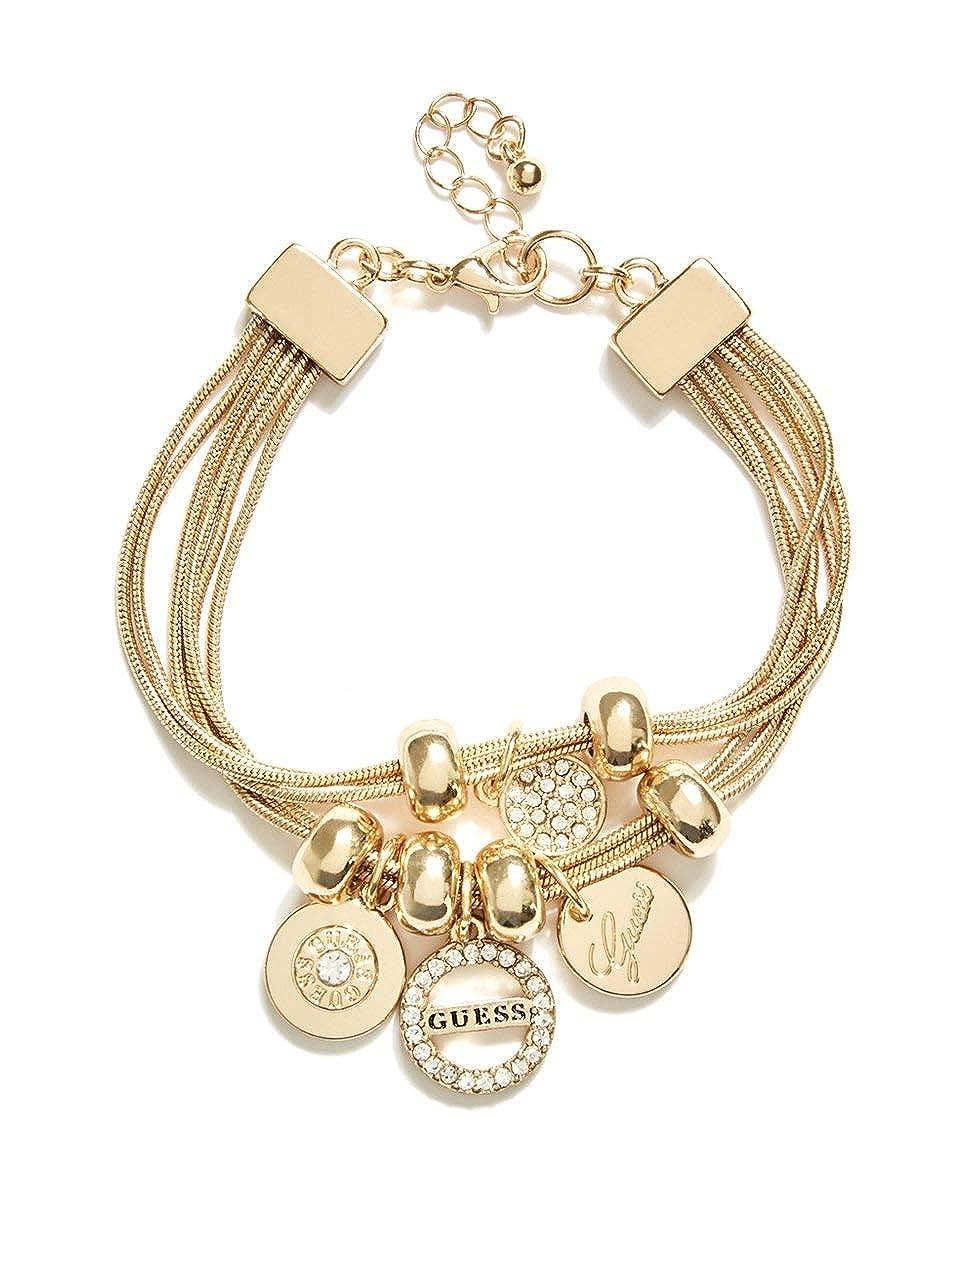 GUESS Factory Women\'s Gold-Tone Charm Bracelet